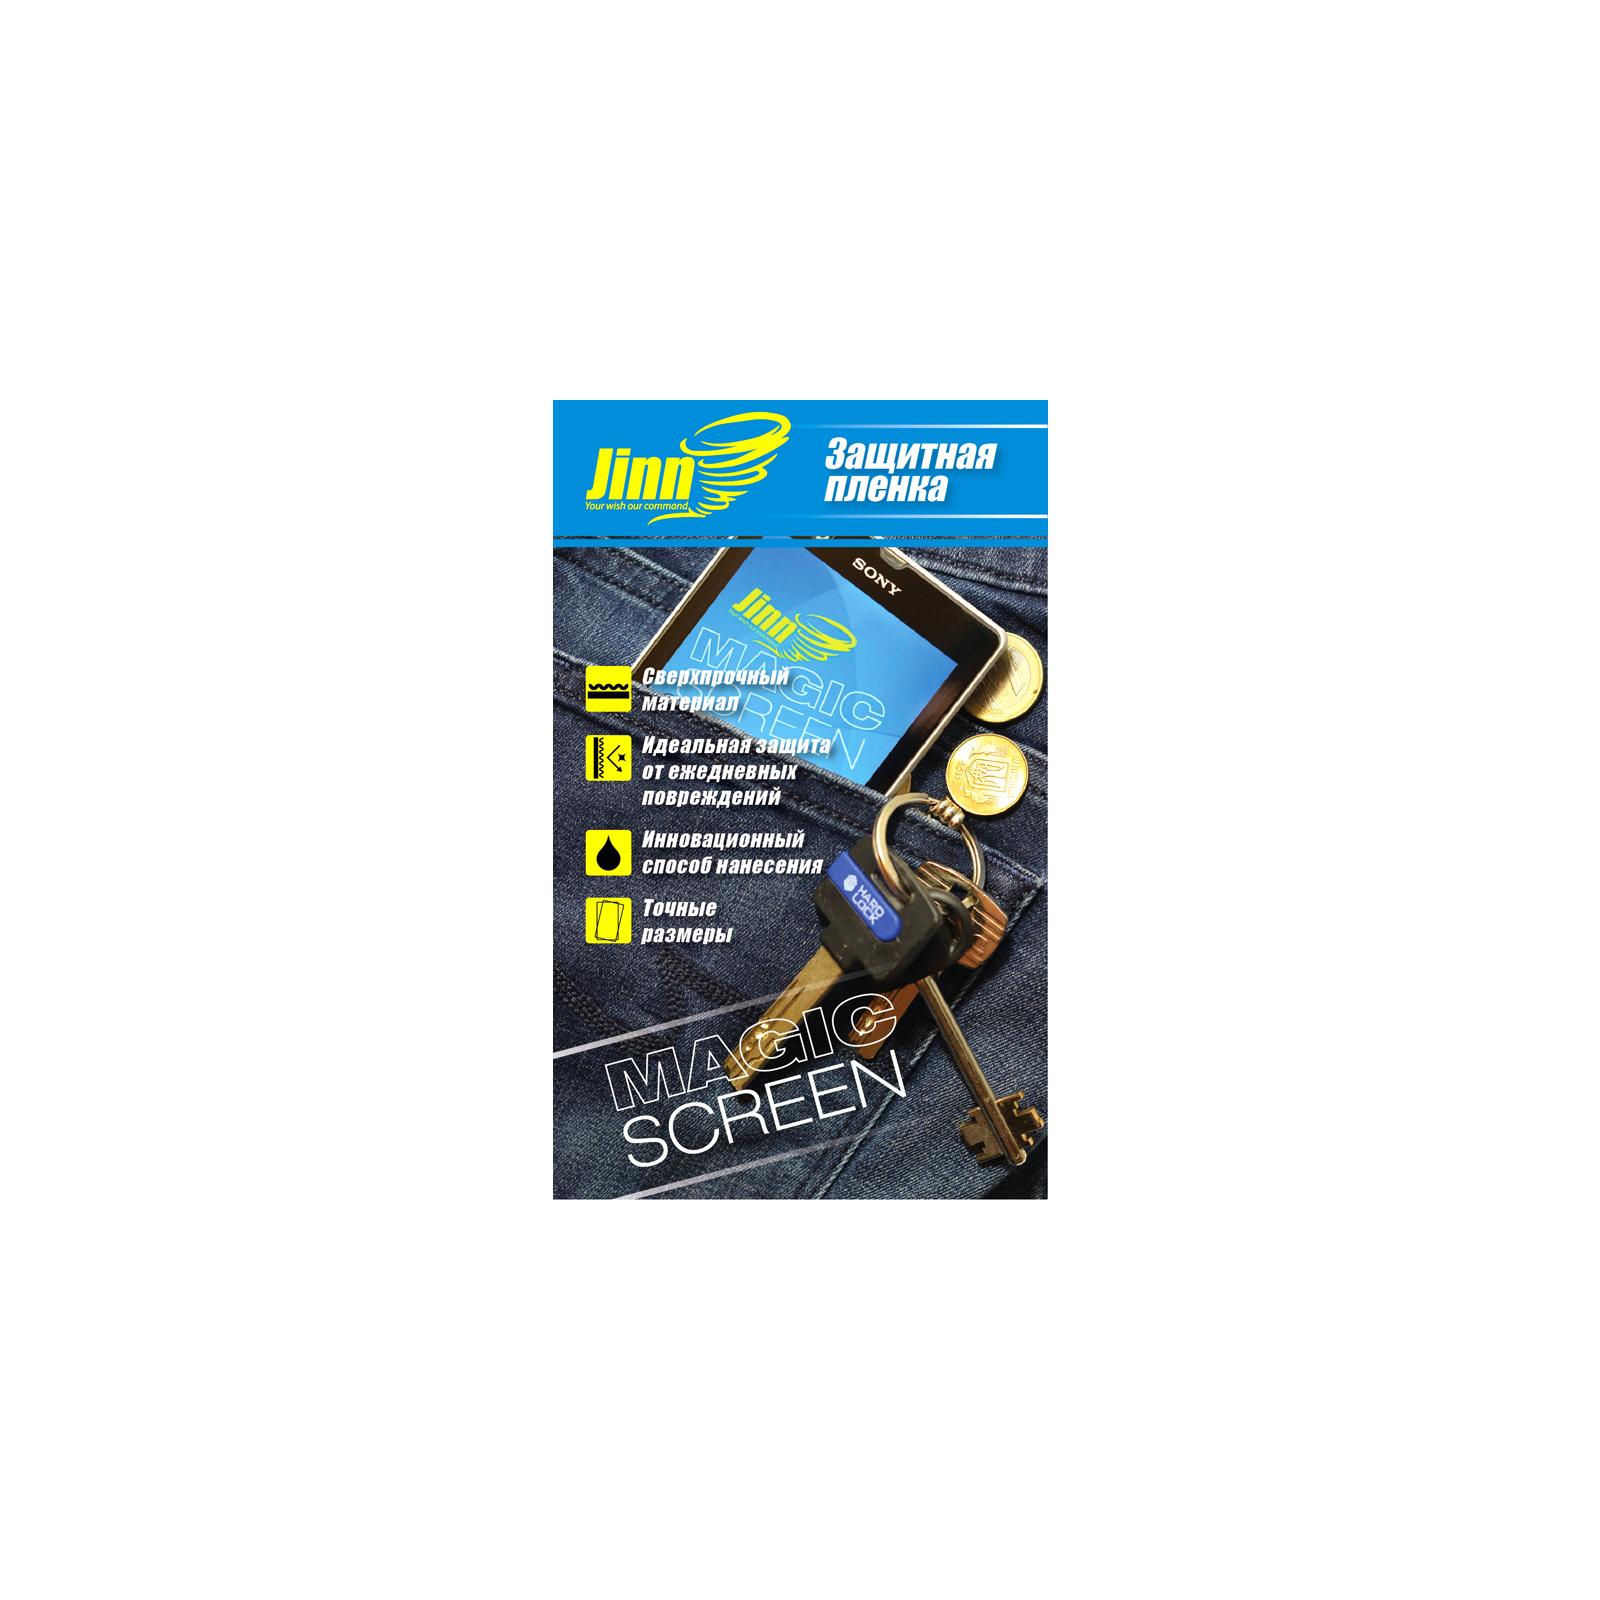 Пленка защитная JINN надміцна Magic Screen для Samsung Galaxy S3 i9300 / i9305 (з (Samsung Galaxy S3 front)